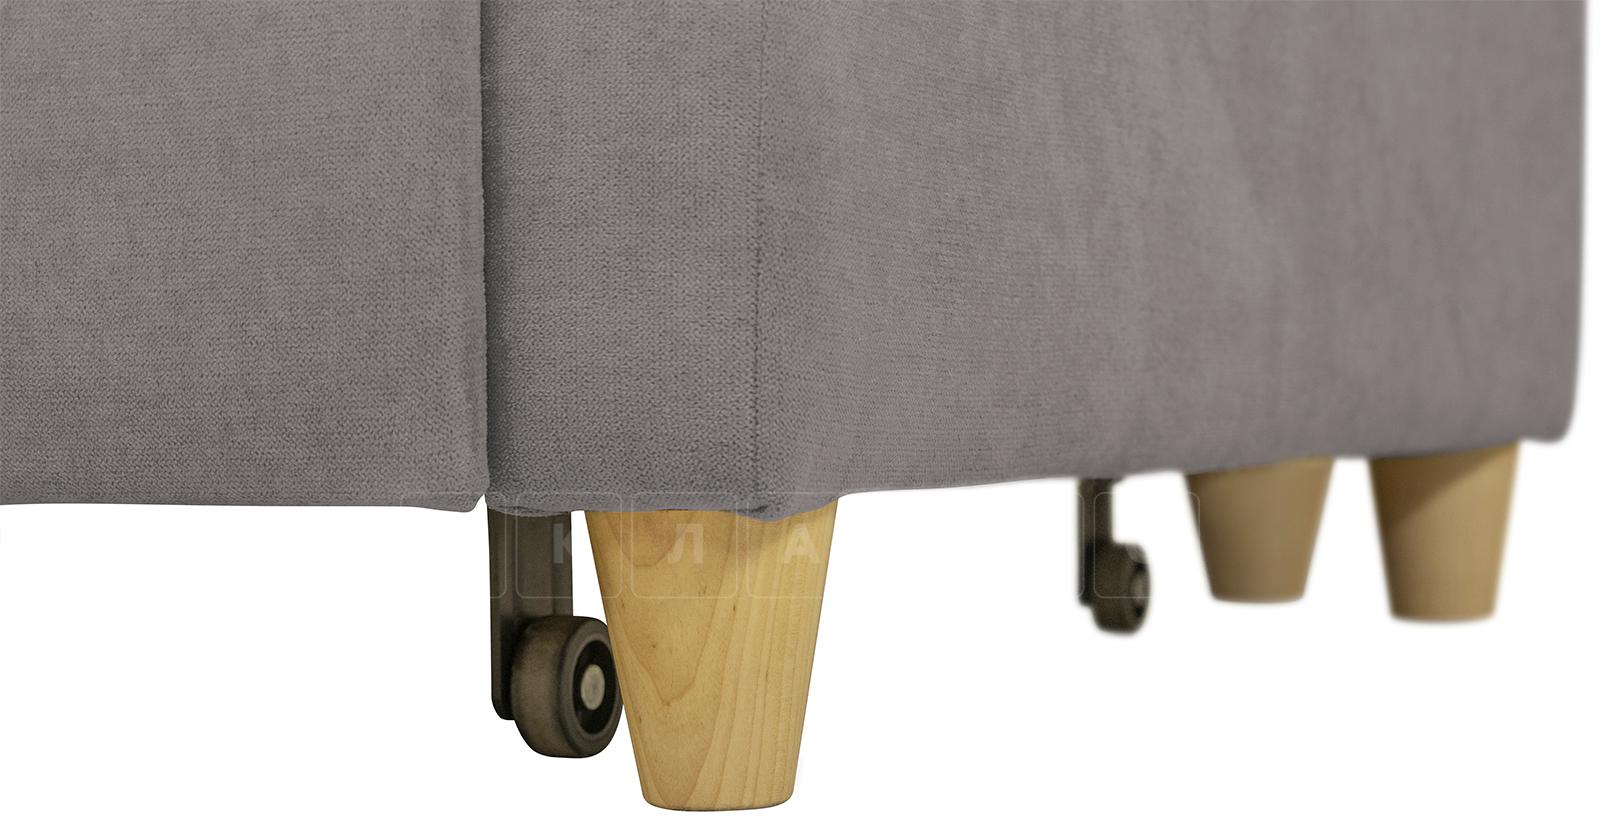 Угловой диван Дарвин серый фото 15 | интернет-магазин Складно